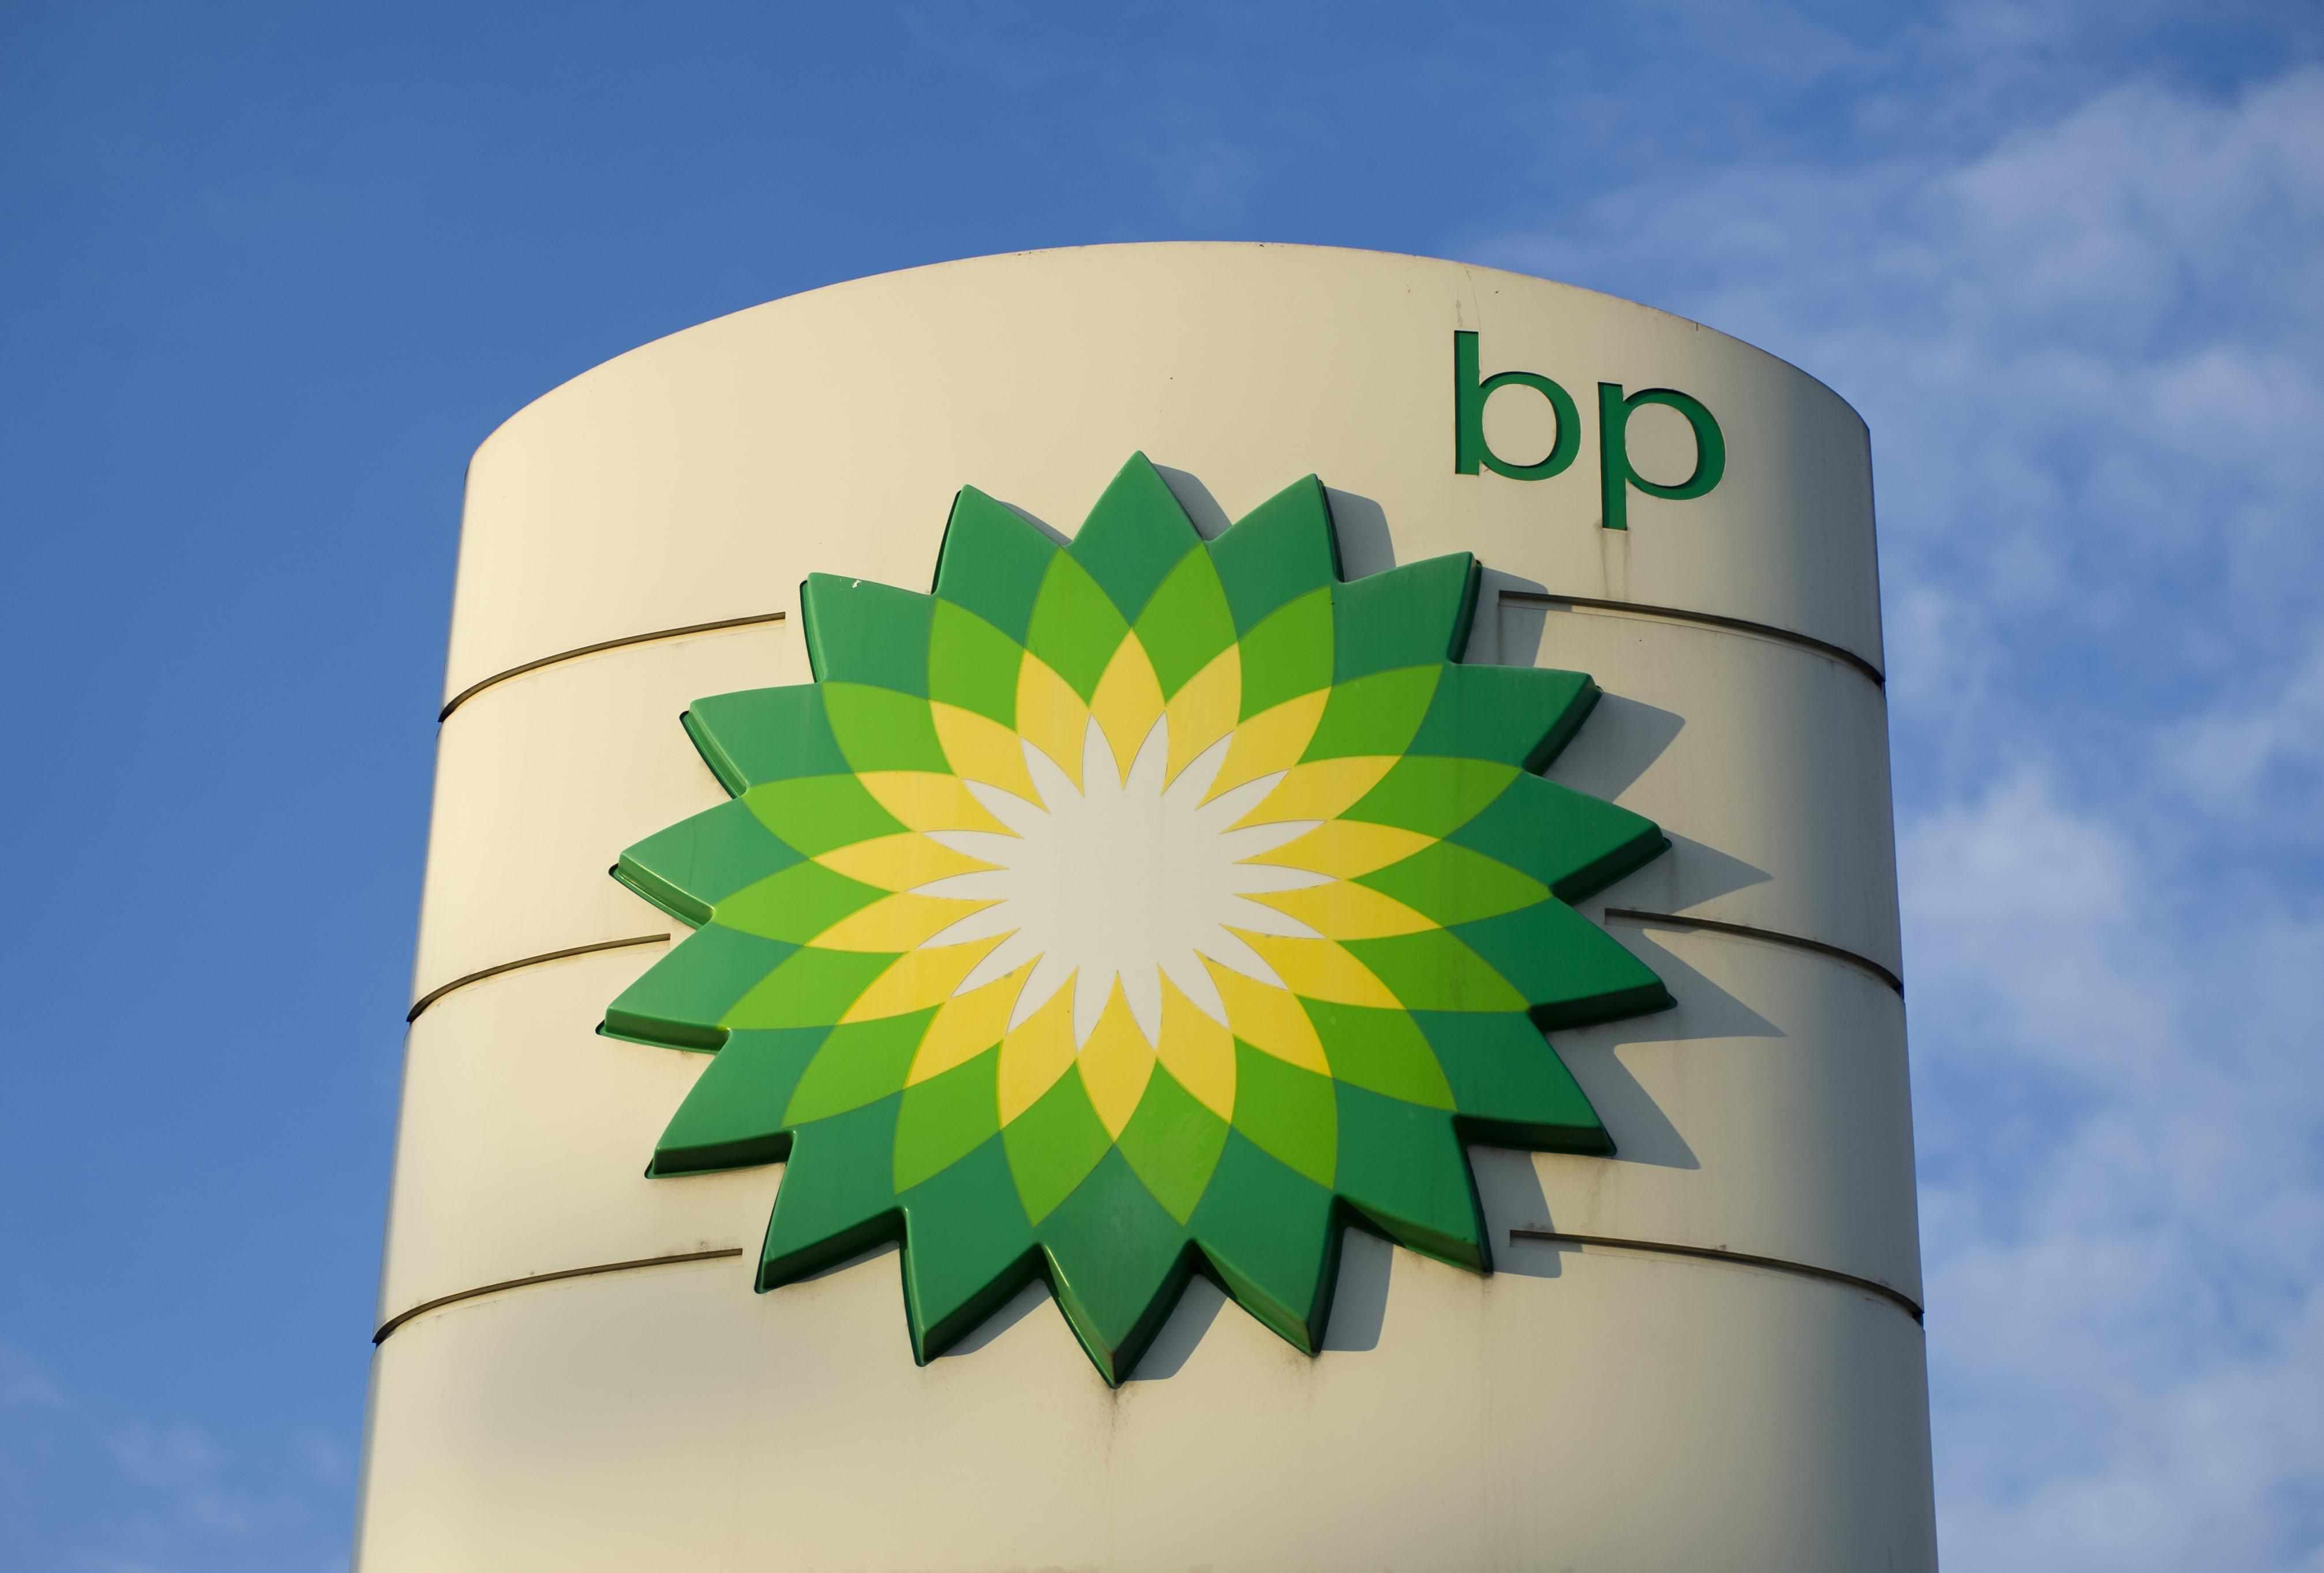 oil energy ignores